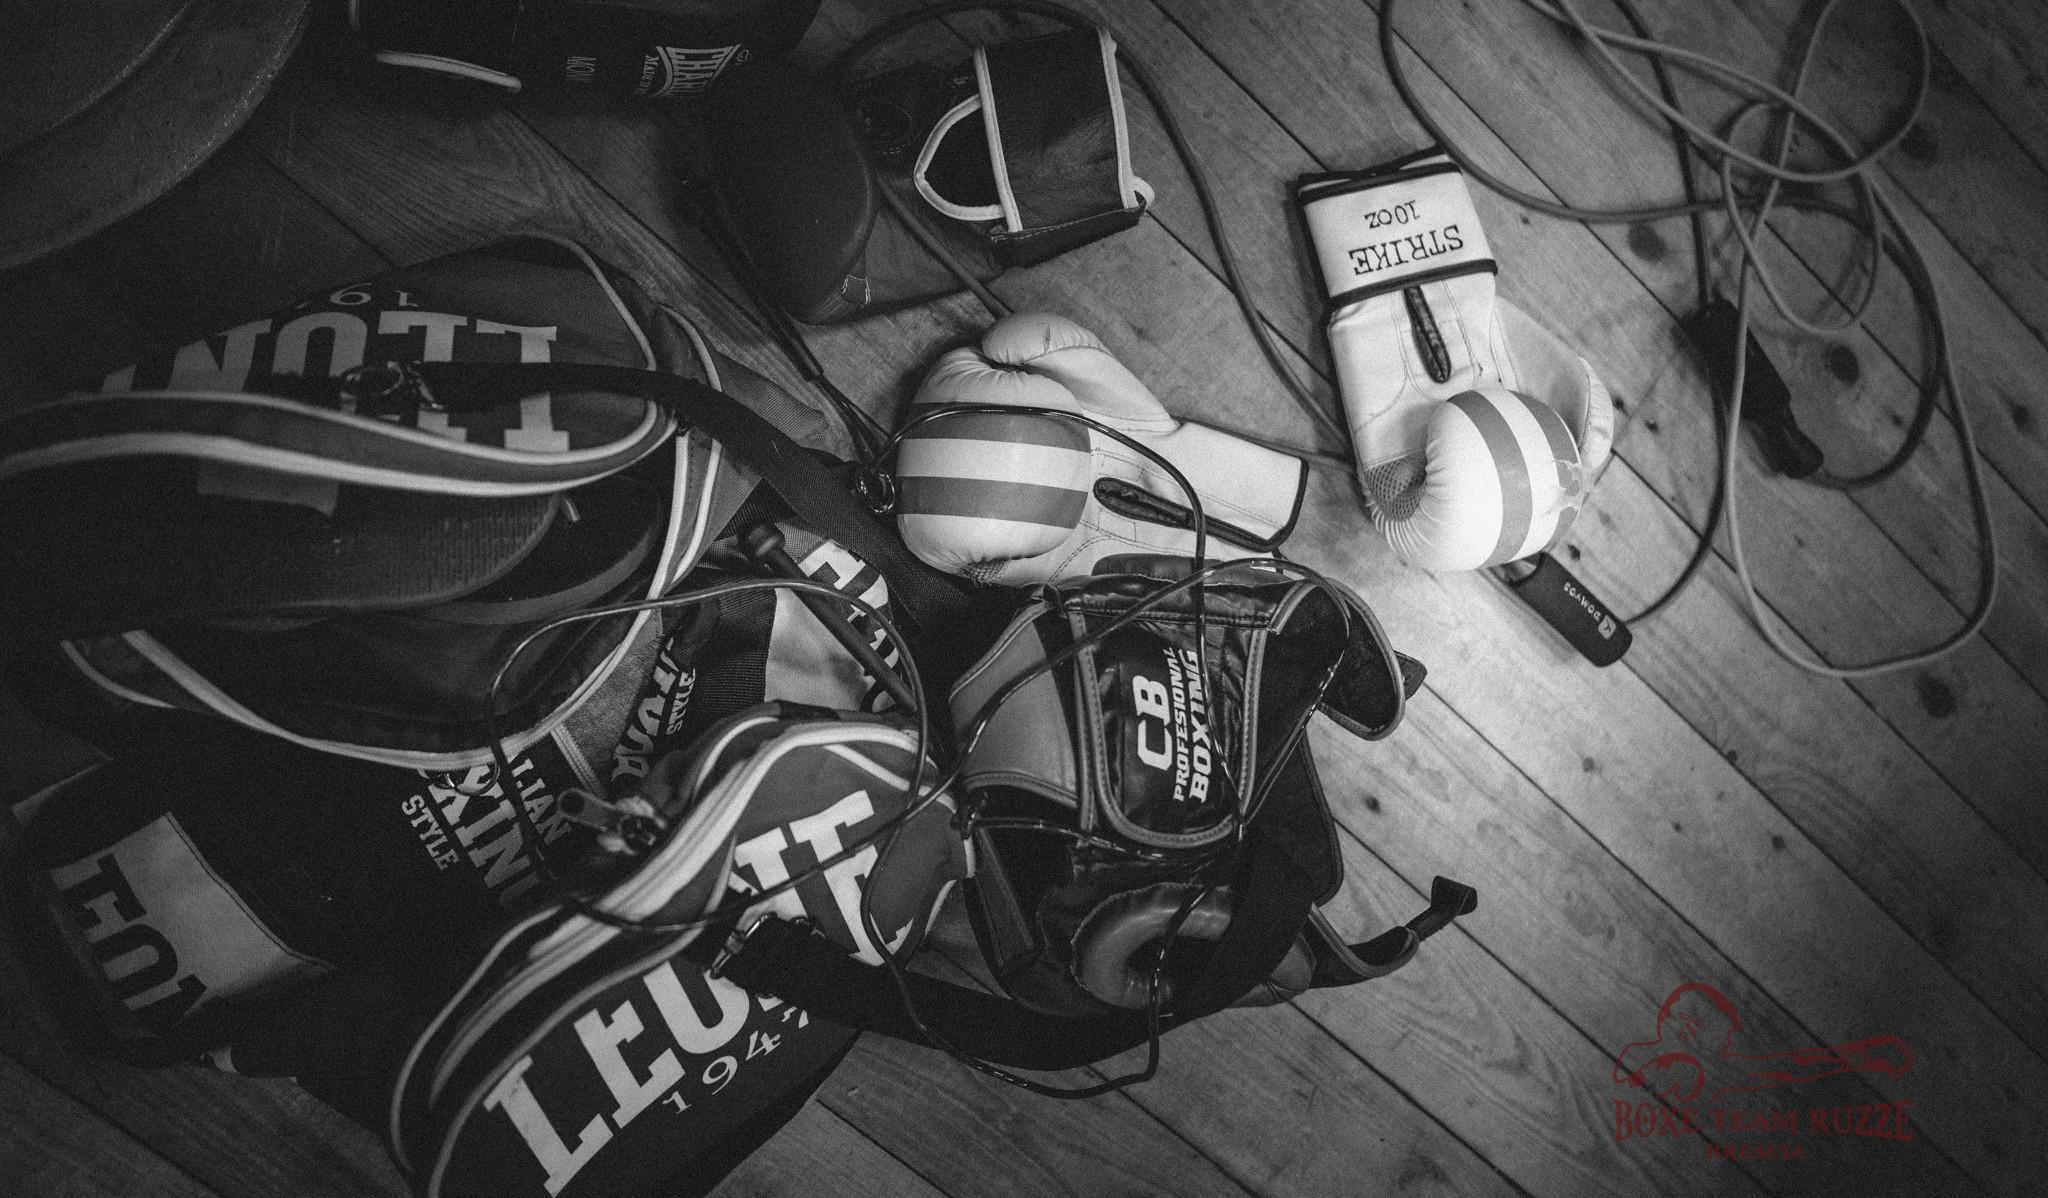 Team Ruzze pugilato by Luca Zizioli Photographer